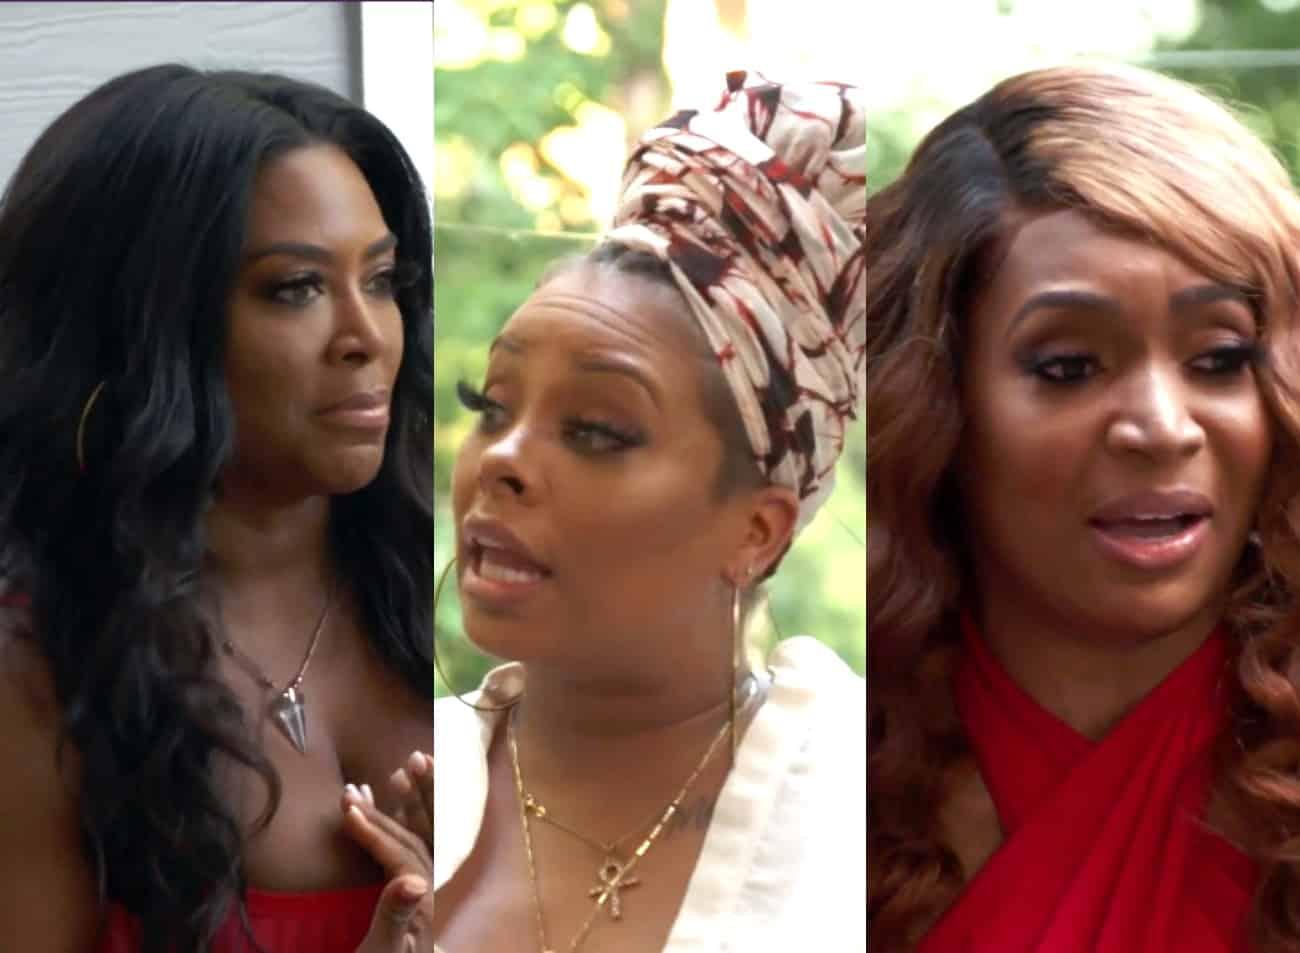 RHOA Recap: Kenya Feuds With Eva and Marlo at Bailey Que! Re-Gifts Eva's Gift to Porsha